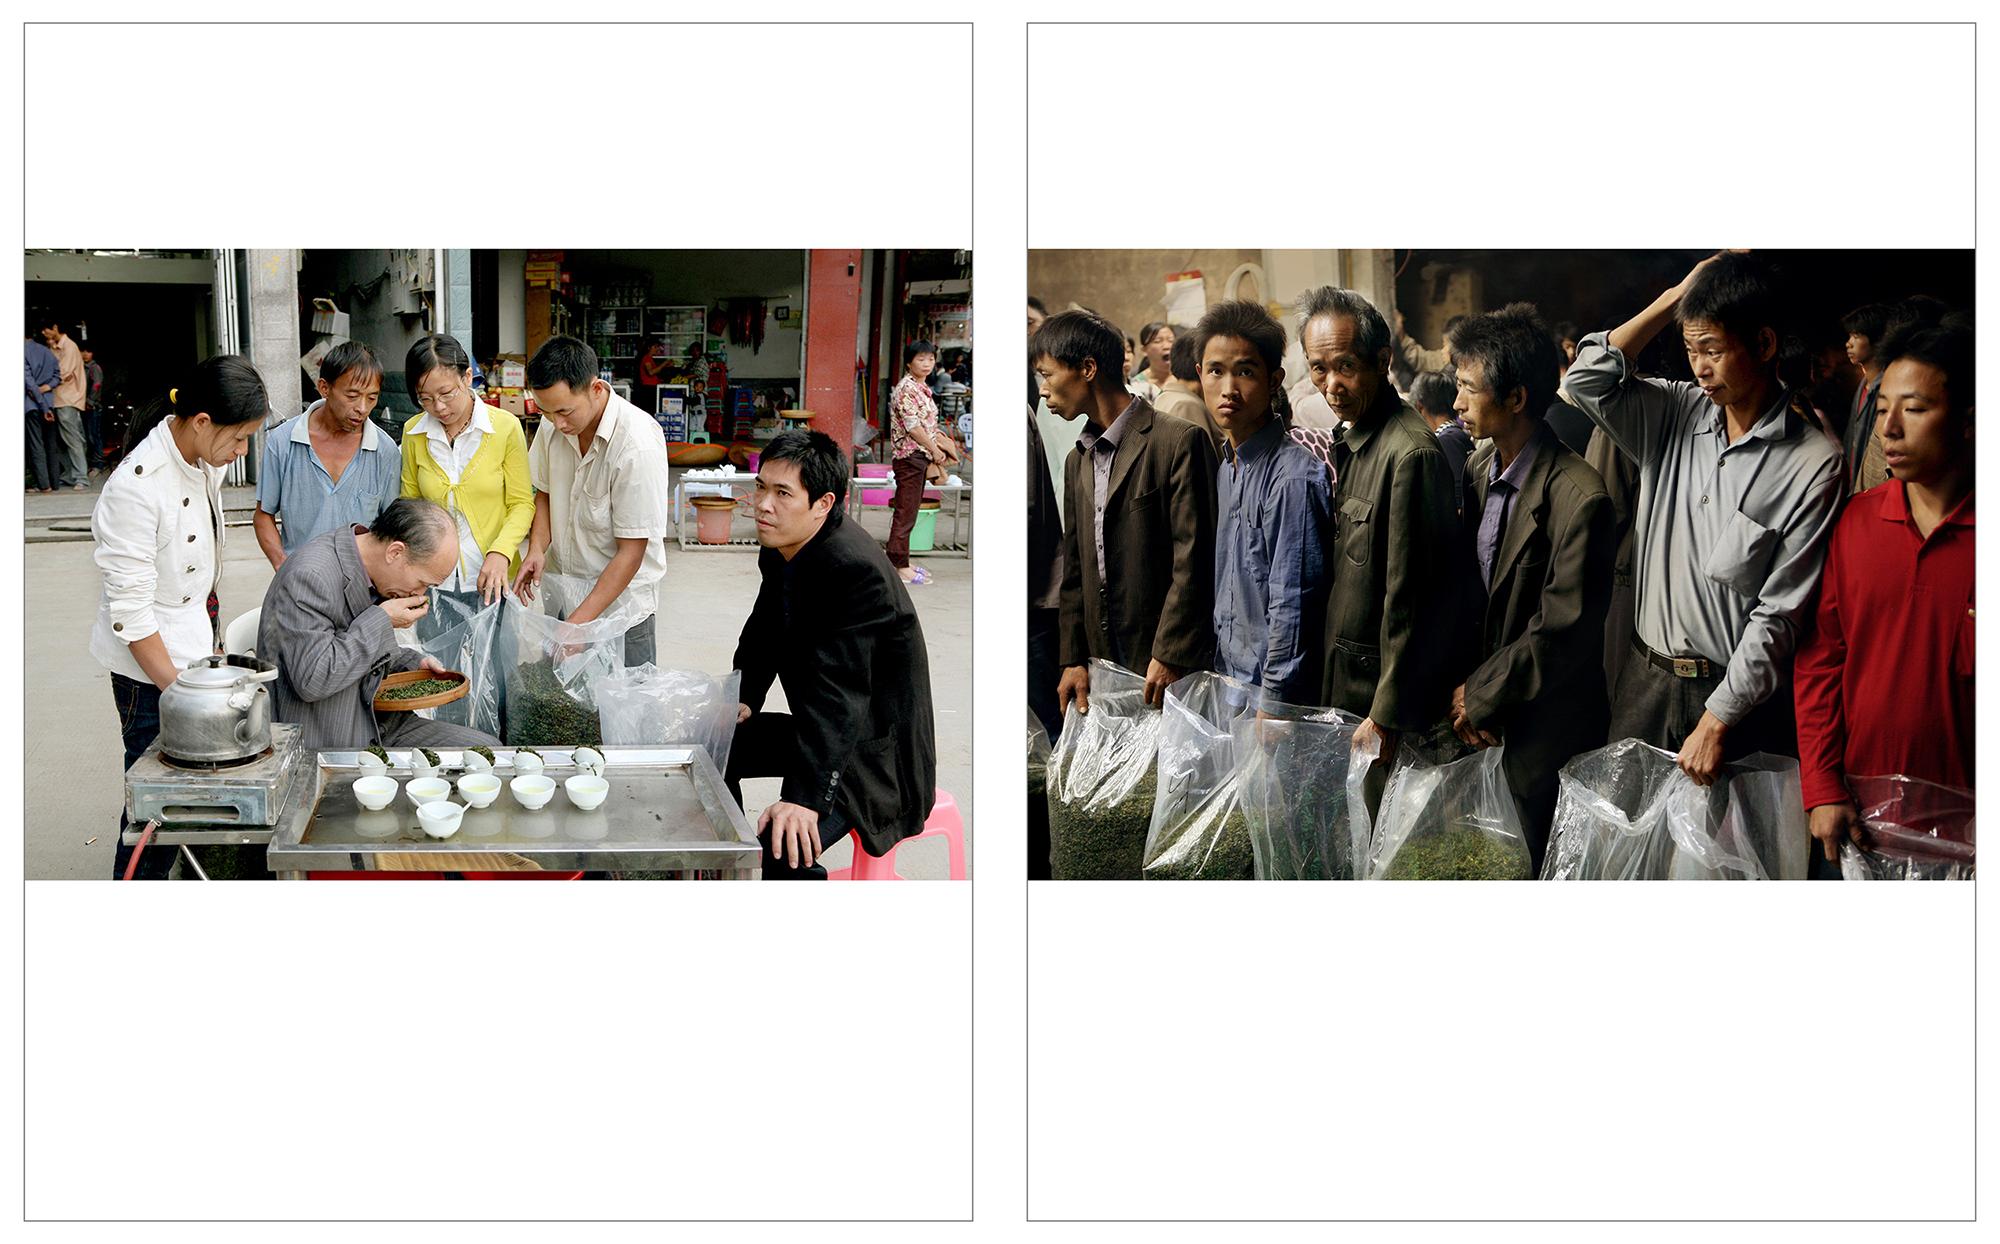 Tea Merchant - Gande, Fujian Province    info  •  Tea Sellers - Gande, Fujian Province  info